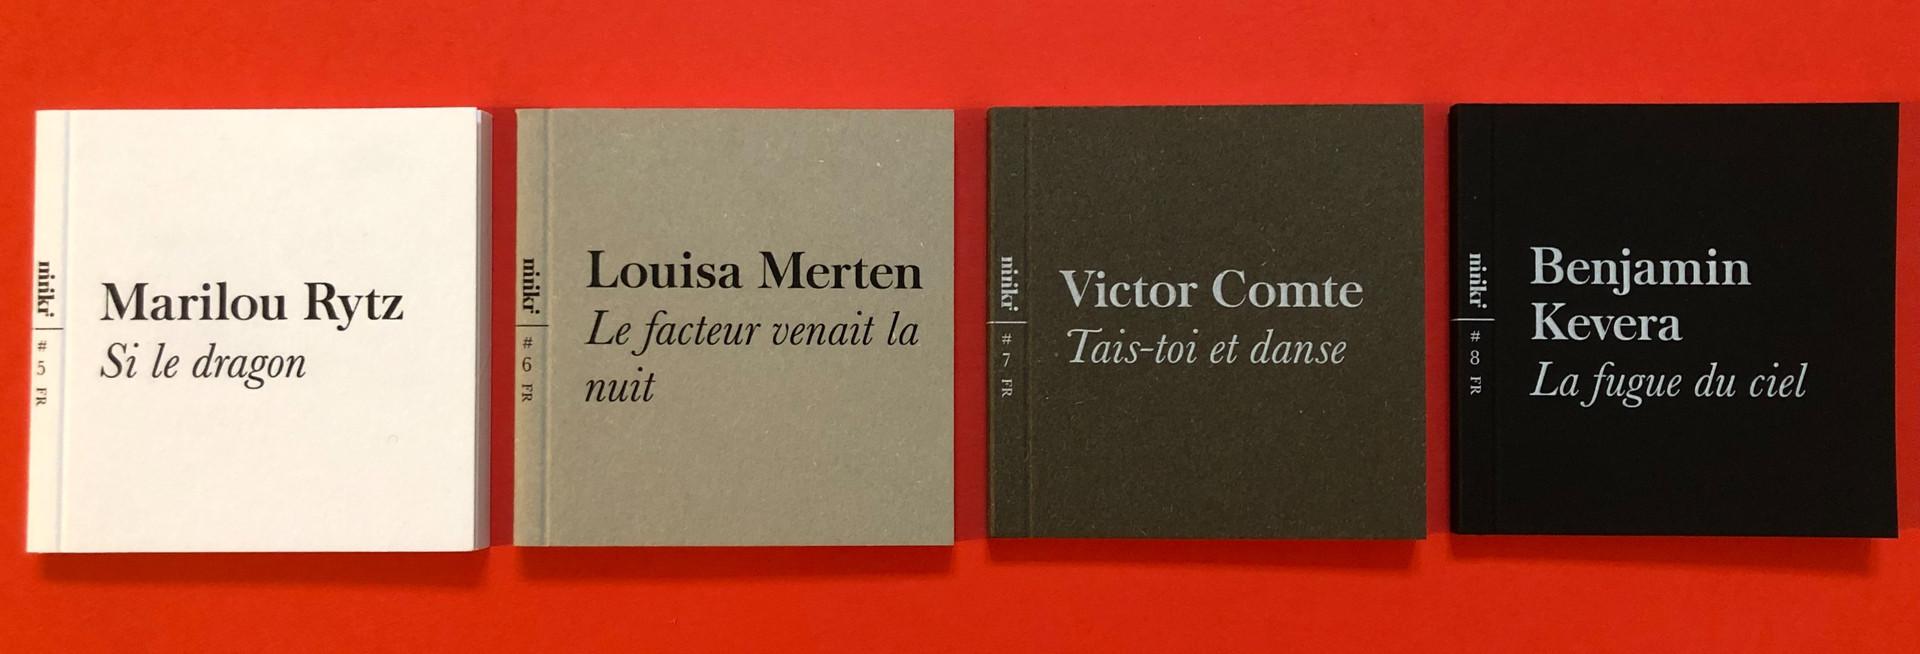 4 livres en français, édition 2020, 29 CHF (frais de port inclus)